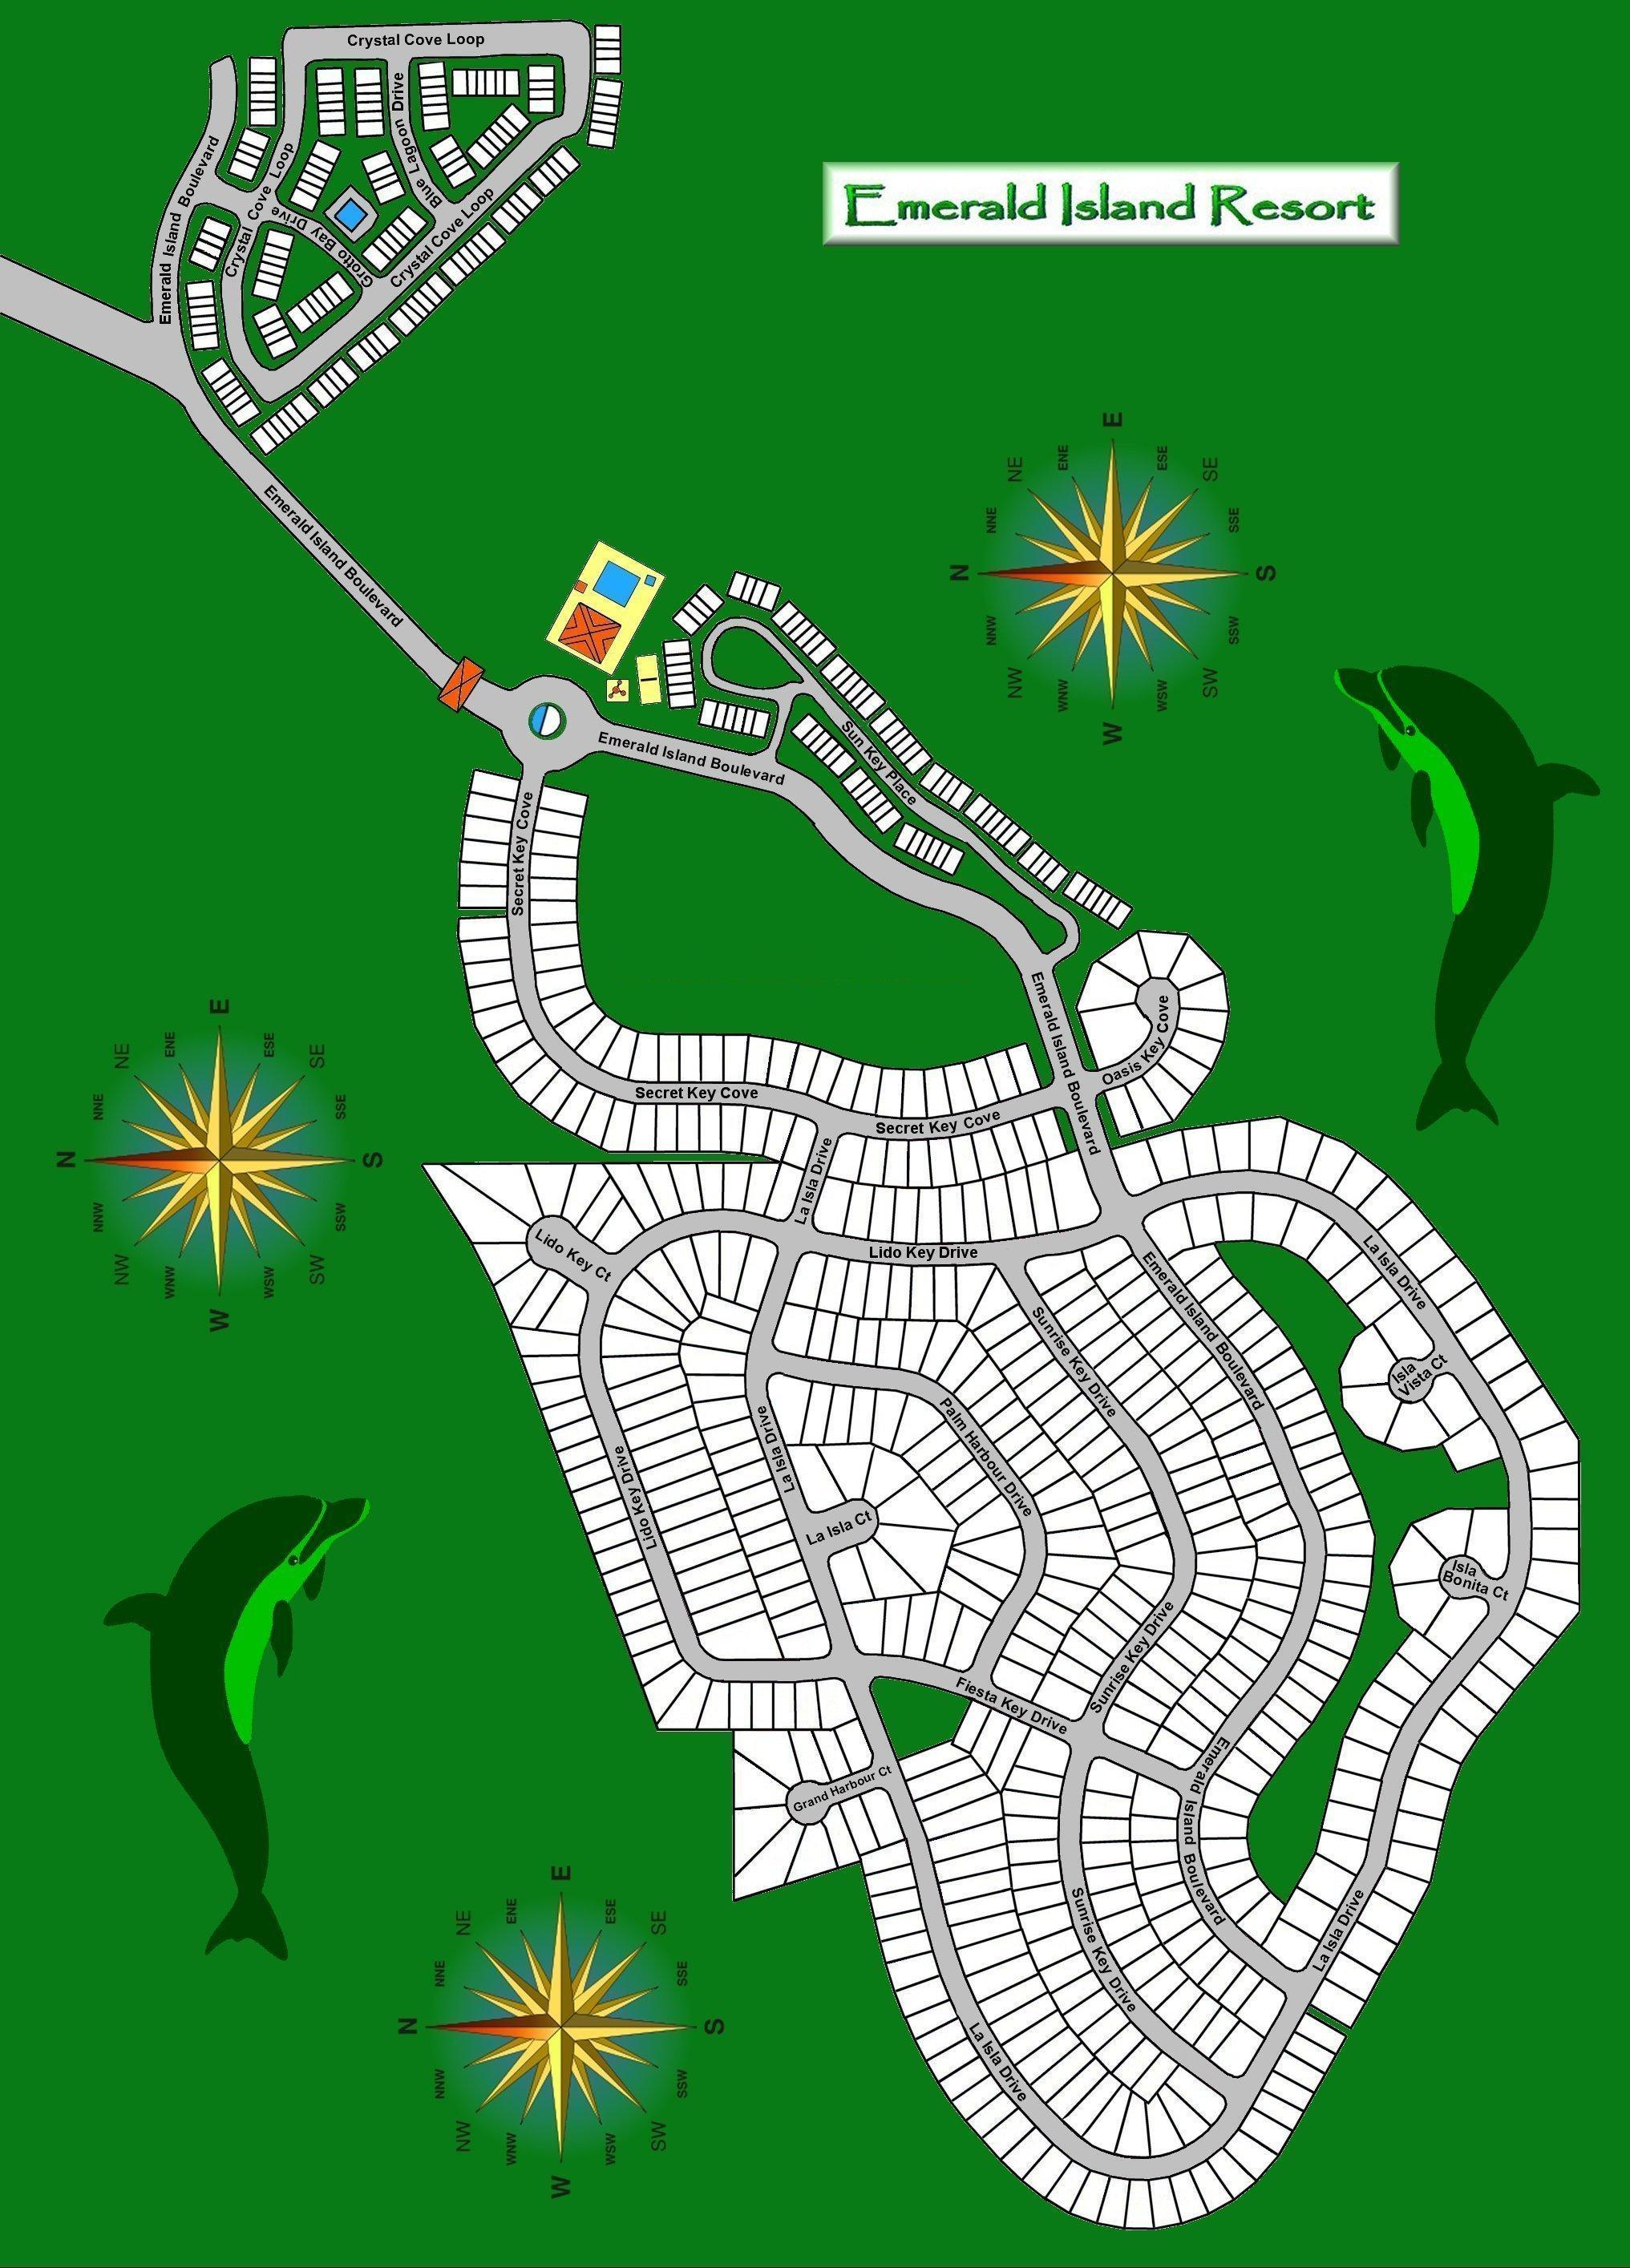 Emerald Island Resort Kissimmee Orlando Florida - Close To Disney Parks - Emerald Island Florida Map